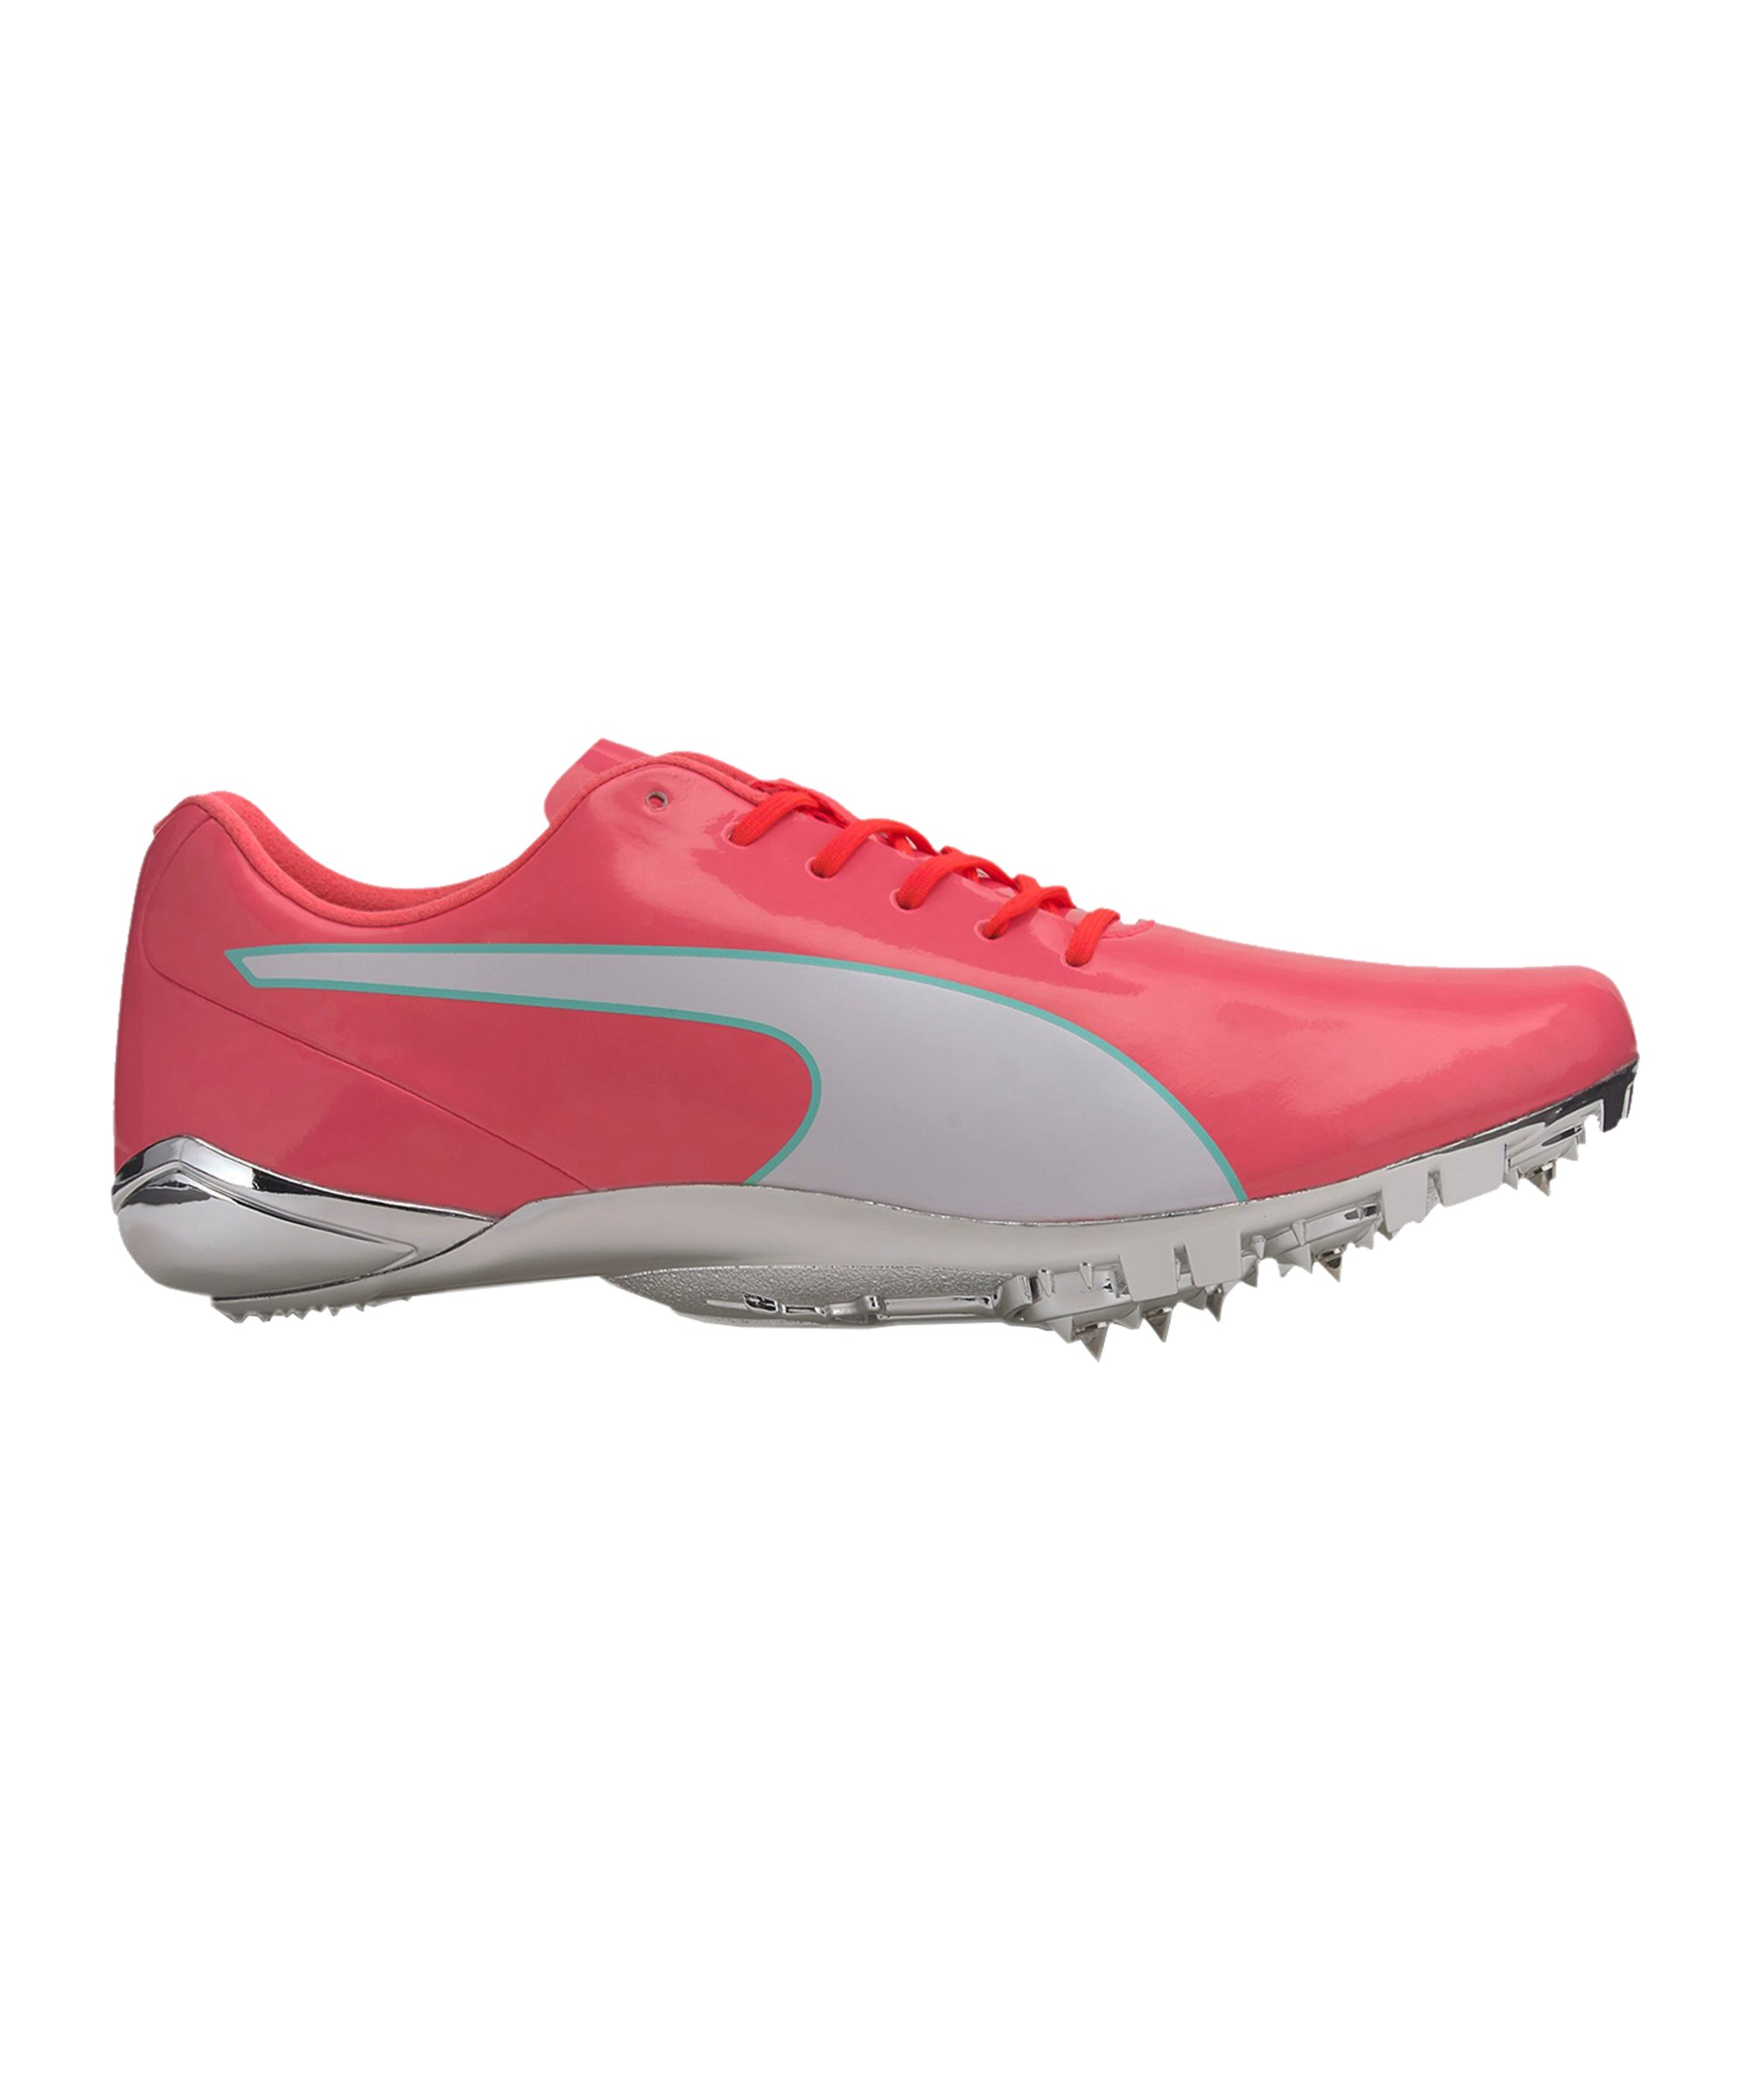 PUMA evoSpeed Electic 8 Spikes Pink F02 - pink